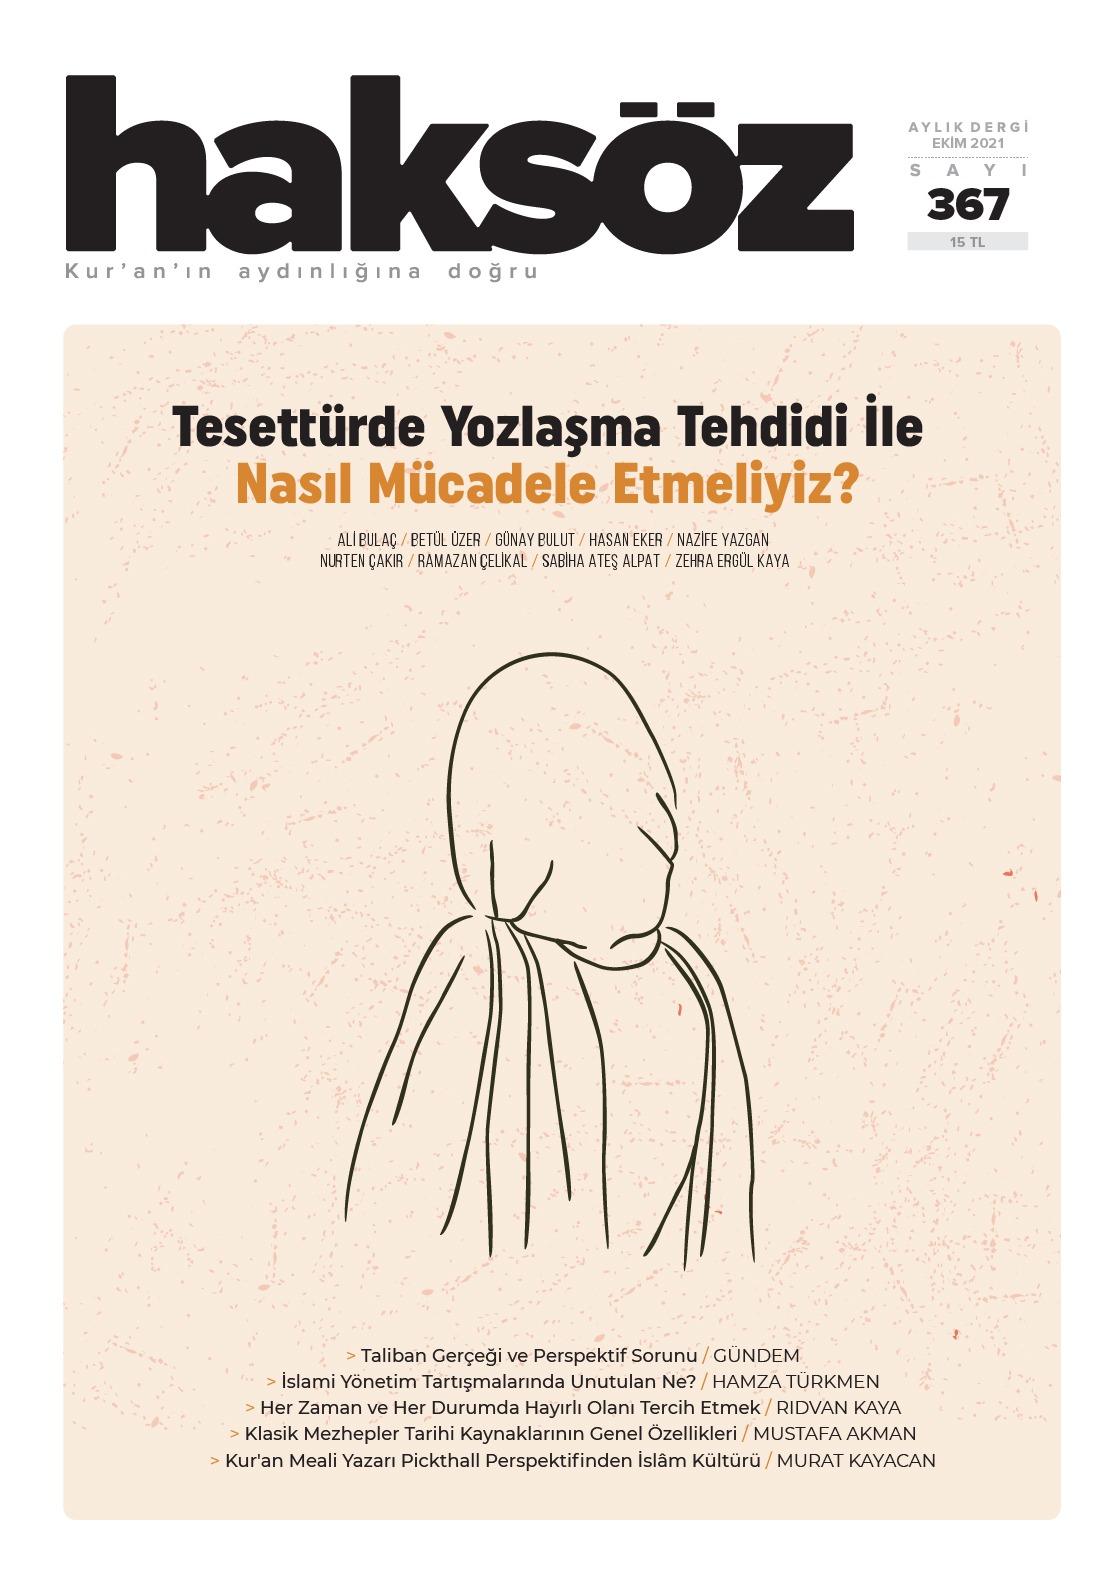 haksoz-dergisi-ekim-2021-367.jpeg